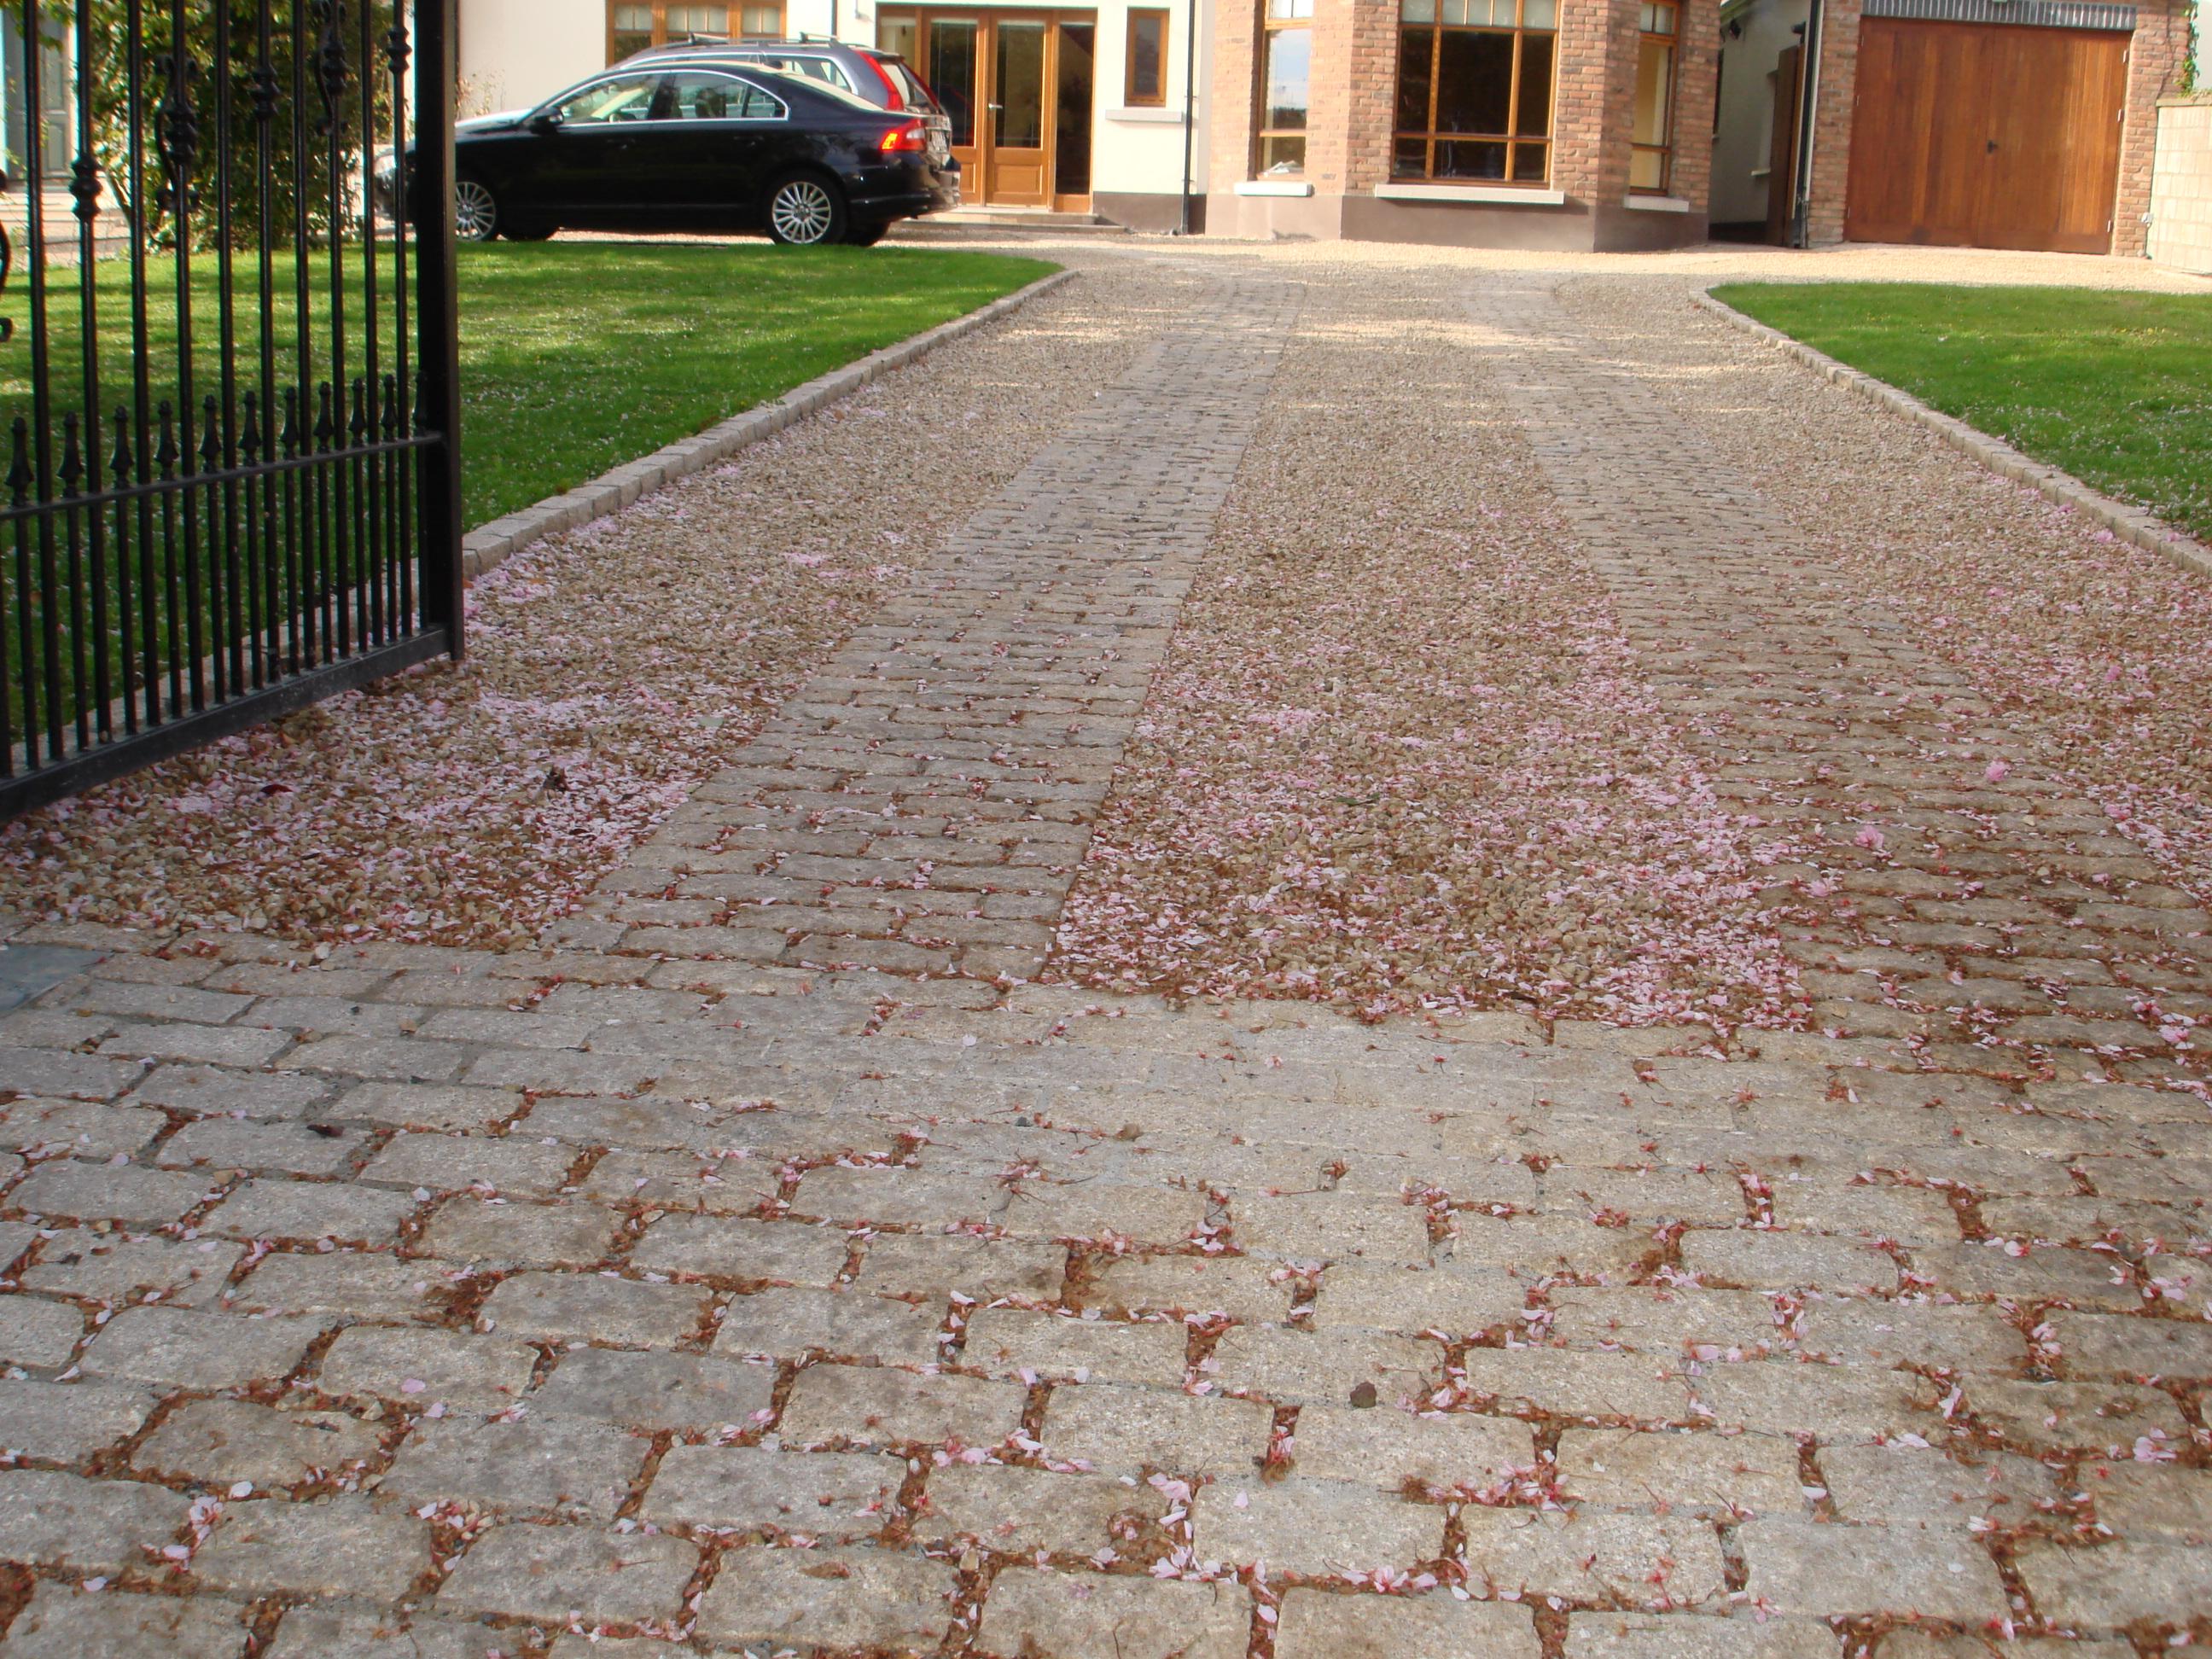 Driveways - Natural Stone, Cobblelock, Resin Bond, Gravel